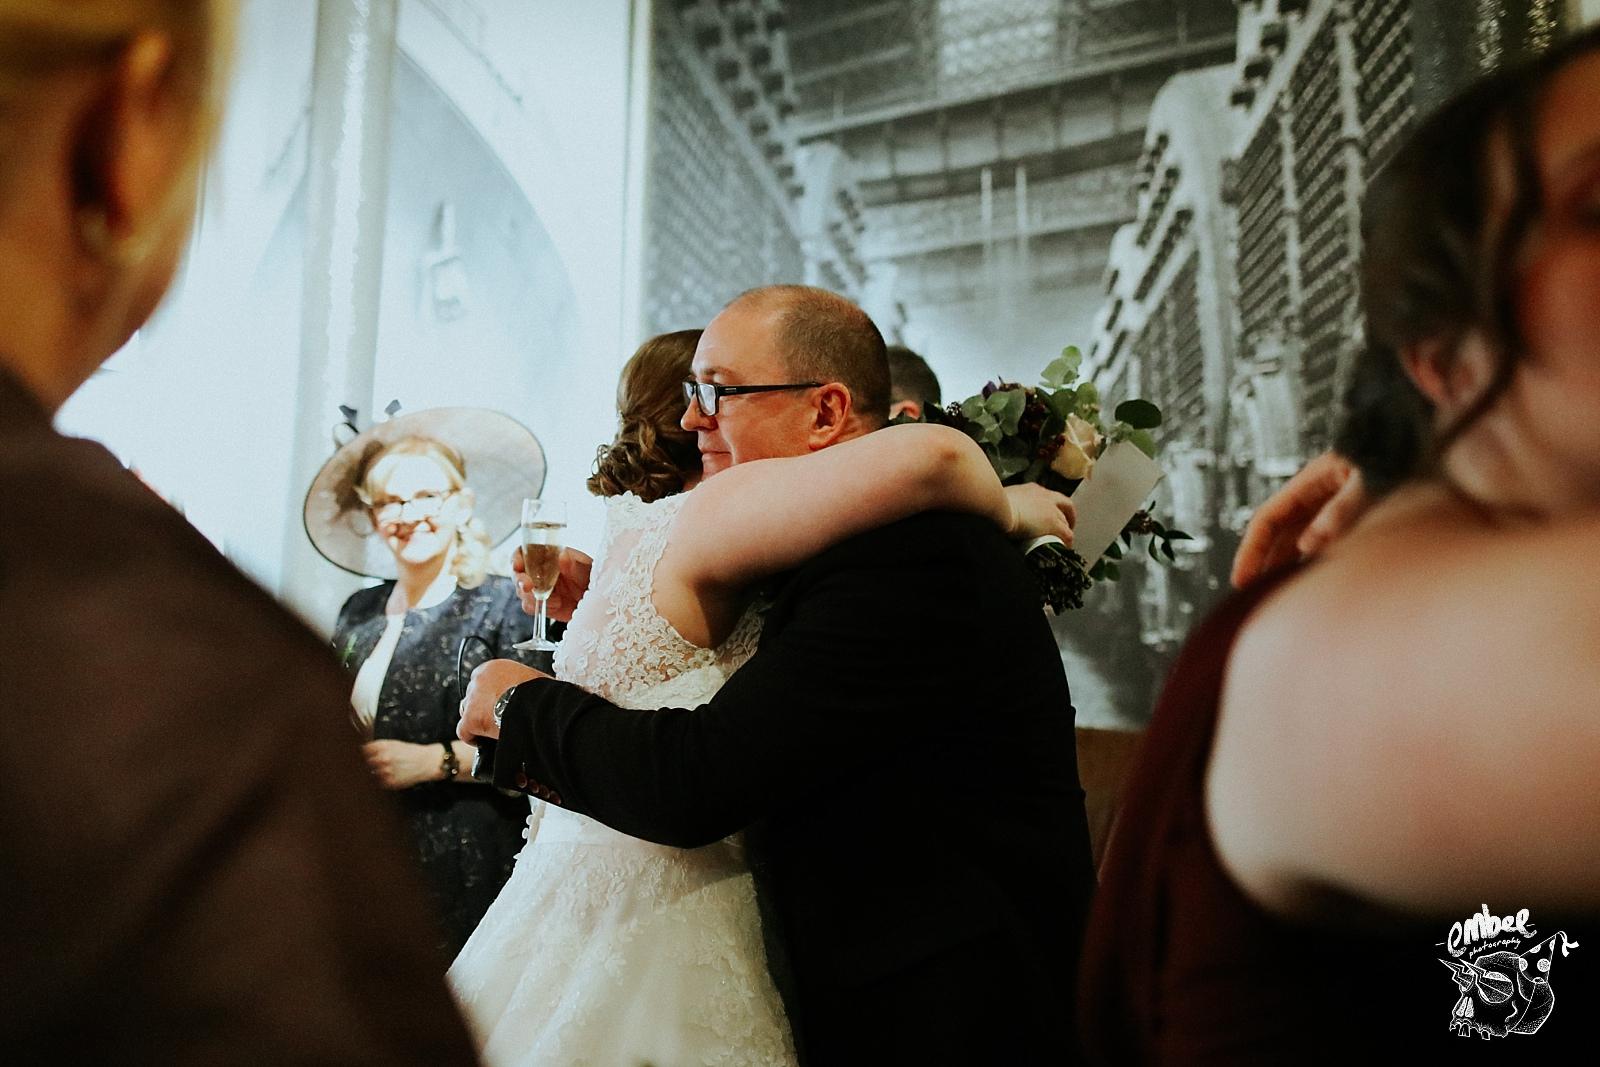 man hugs bride after getting married